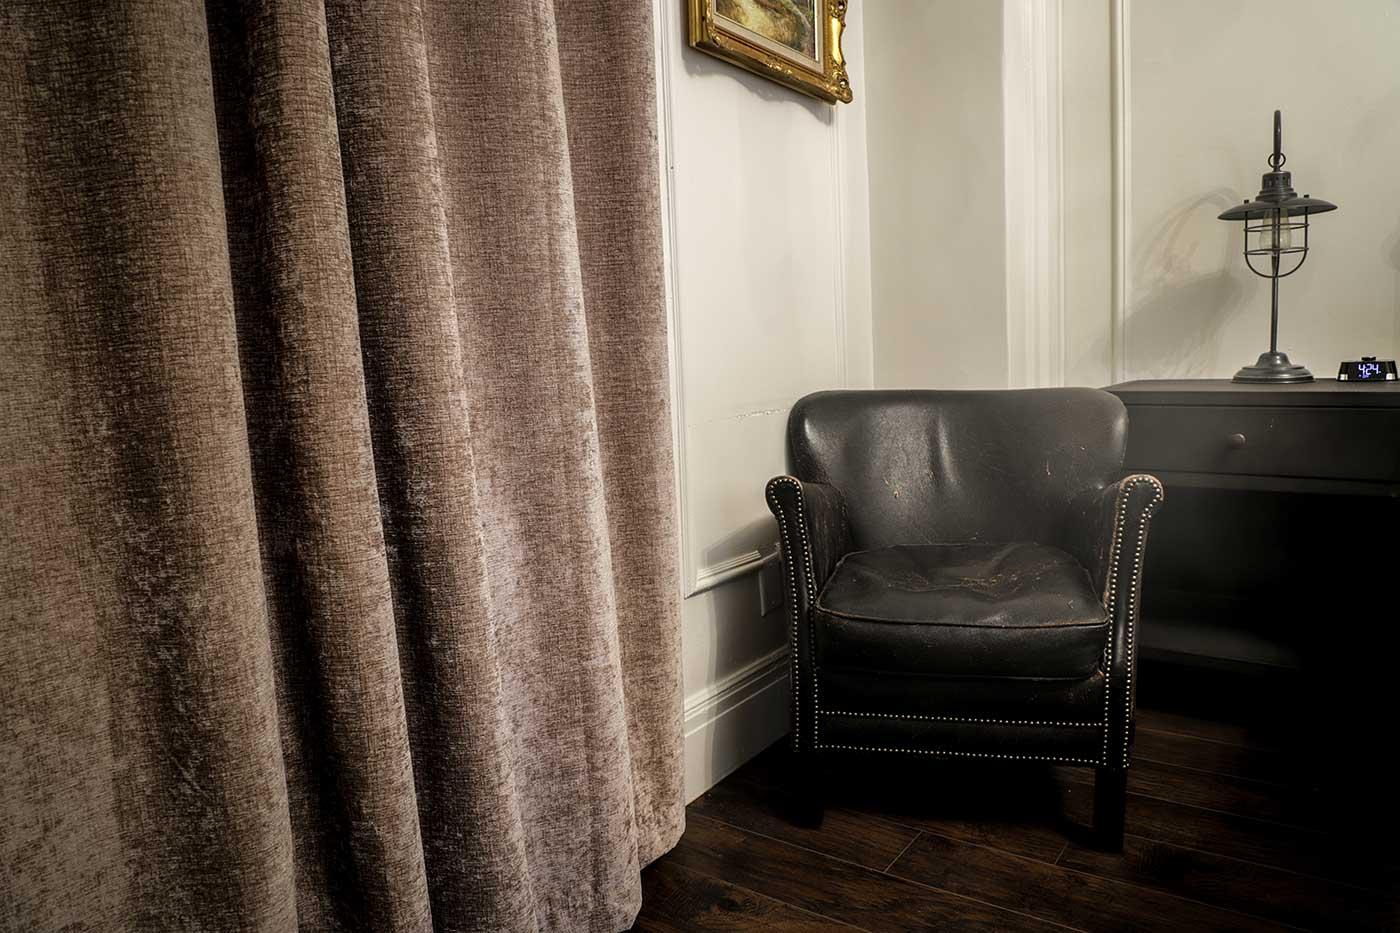 Ghost mist in Room 202 at Fort Garry Hotel, Winnipeg.